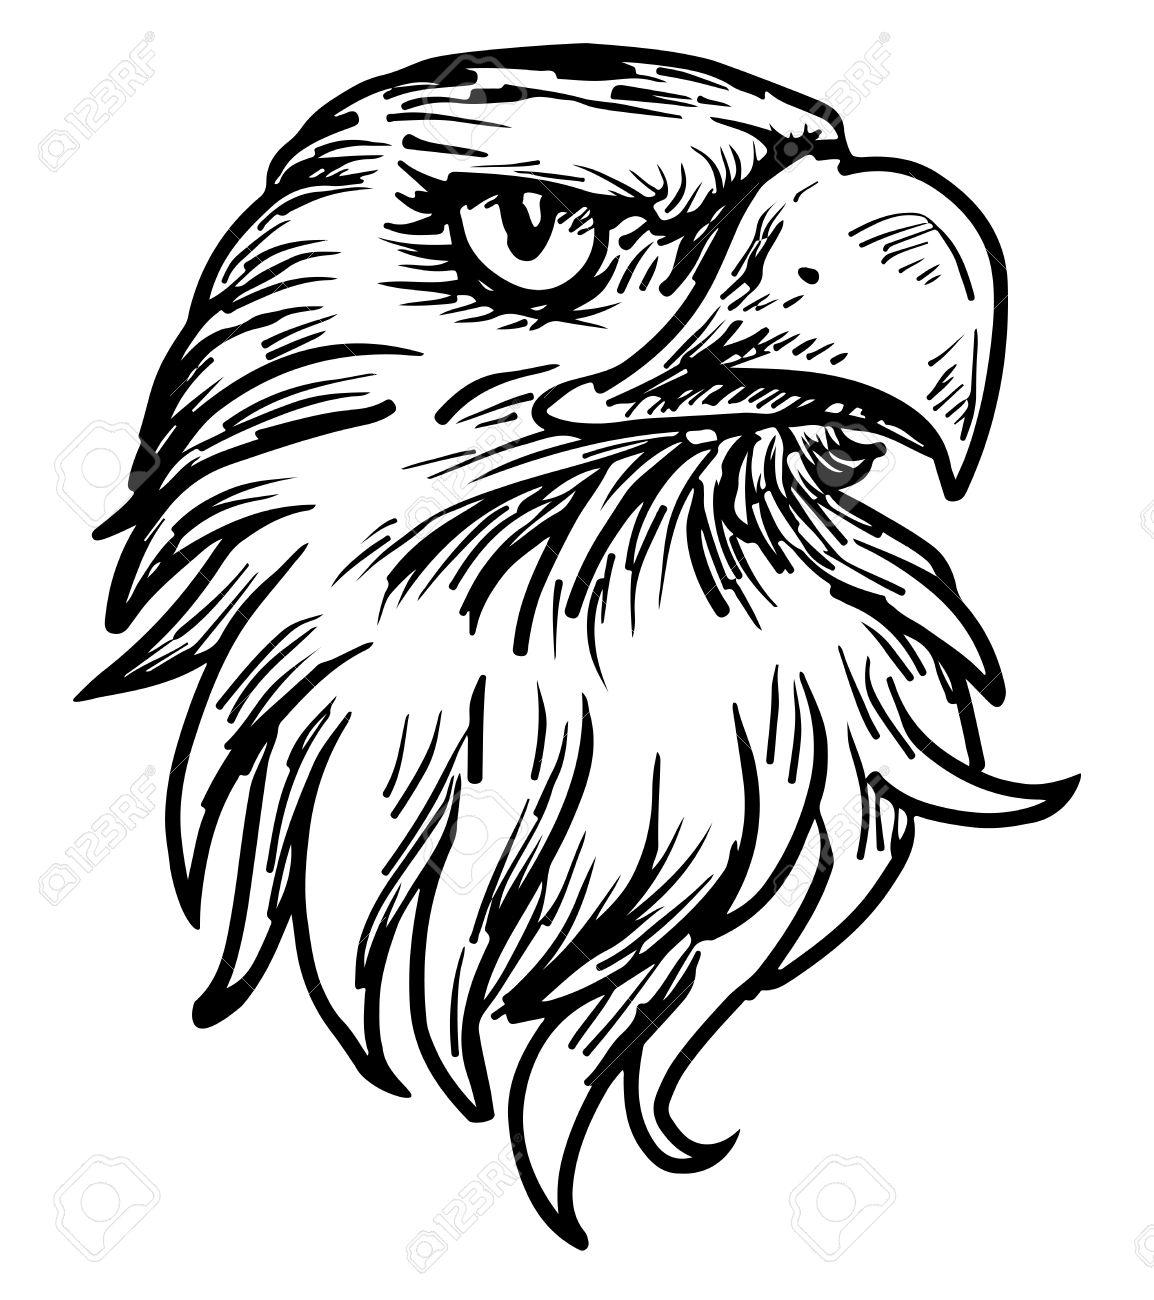 Eagle Head Line Drawing At Getdrawings